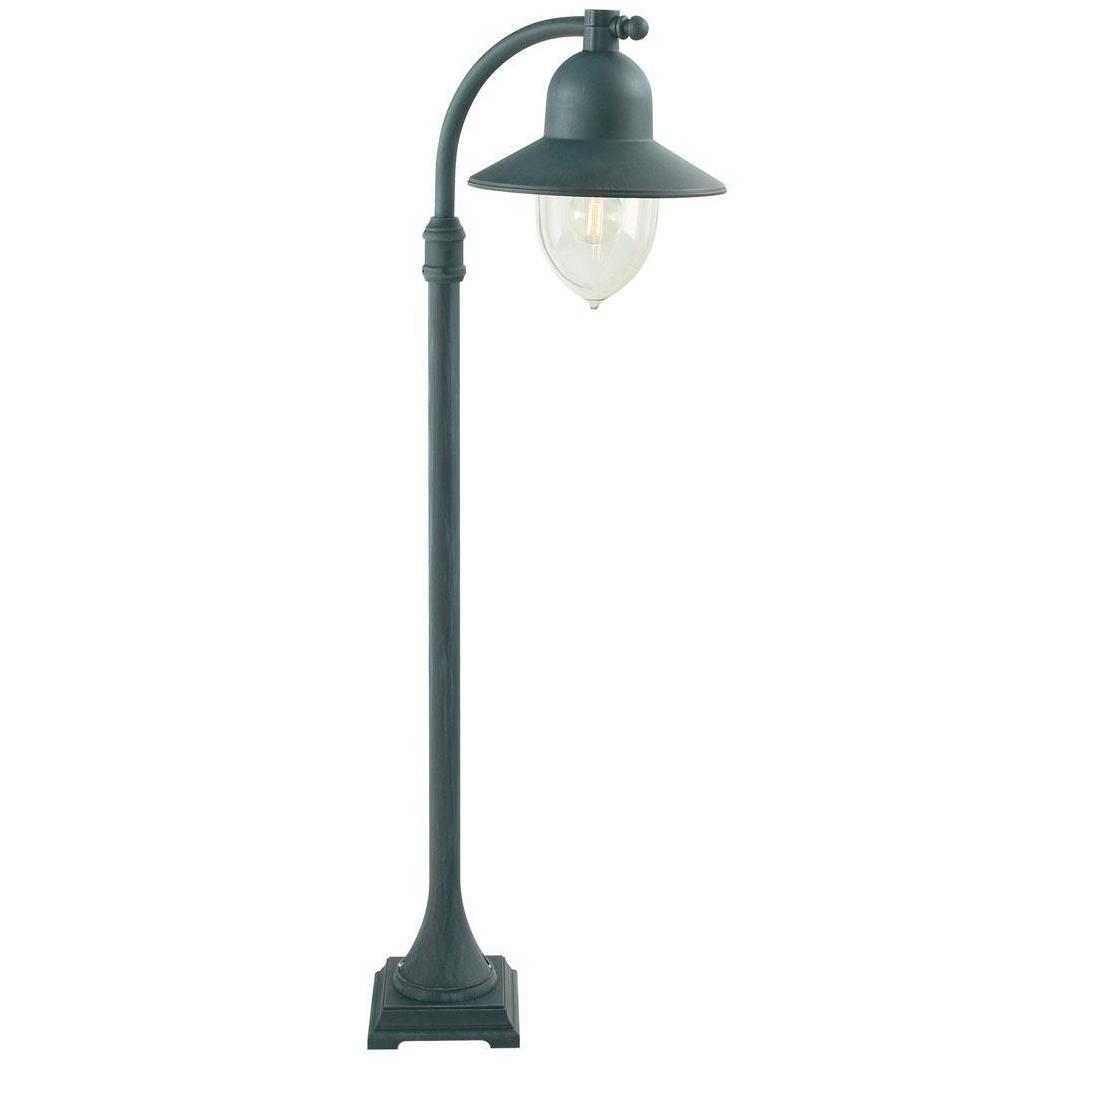 Norlys como mastleuchte designer lampen online kaufen for Lampen bestellen